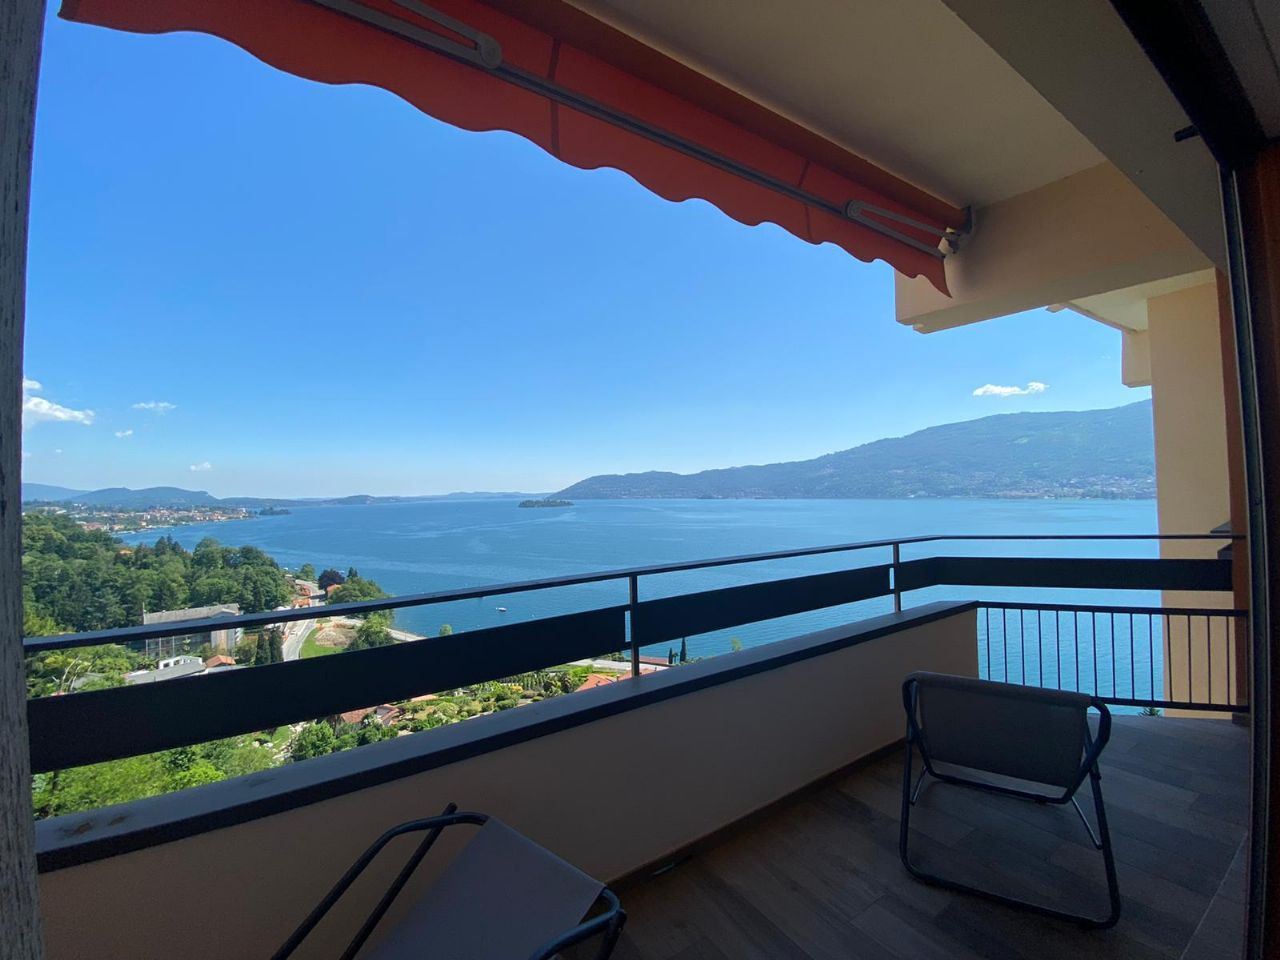 Appartamento monolocale vista lago a Verbania Suna